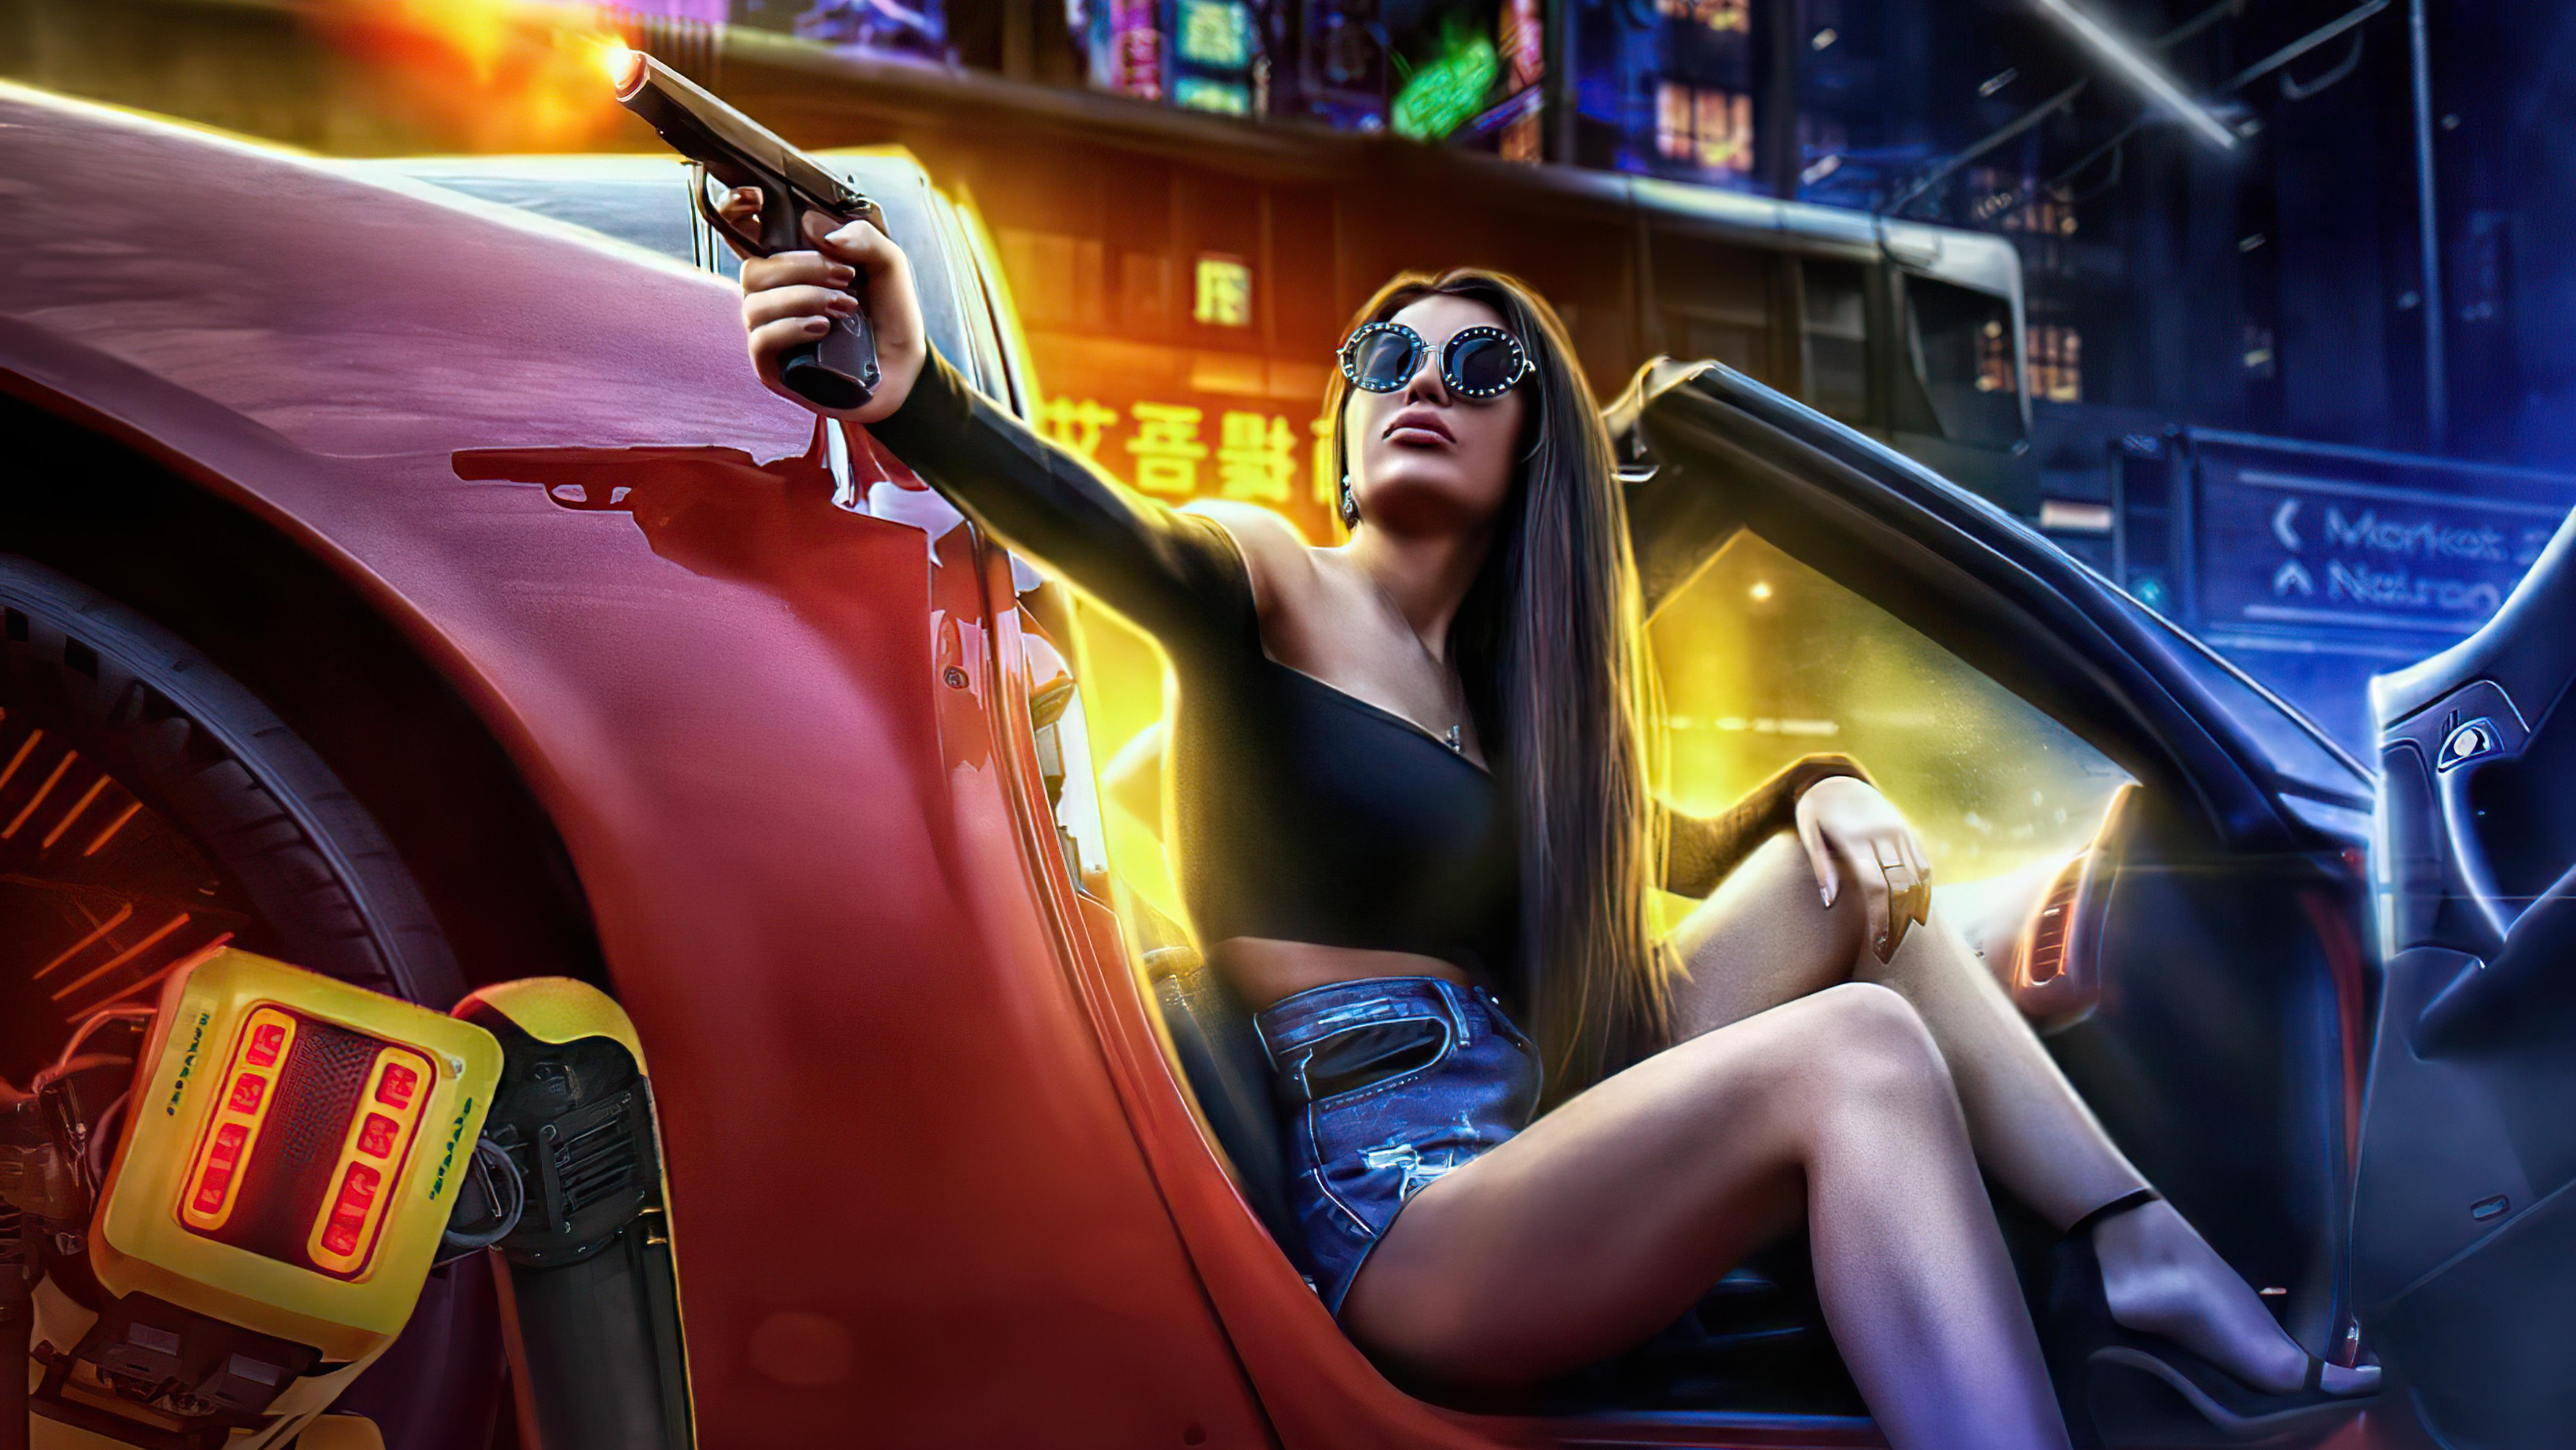 girl with gun in car pointing gun scifi 4k 1618132912 - Girl With Gun In Car Pointing Gun Scifi 4k - Girl With Gun In Car Pointing Gun Scifi 4k wallpapers